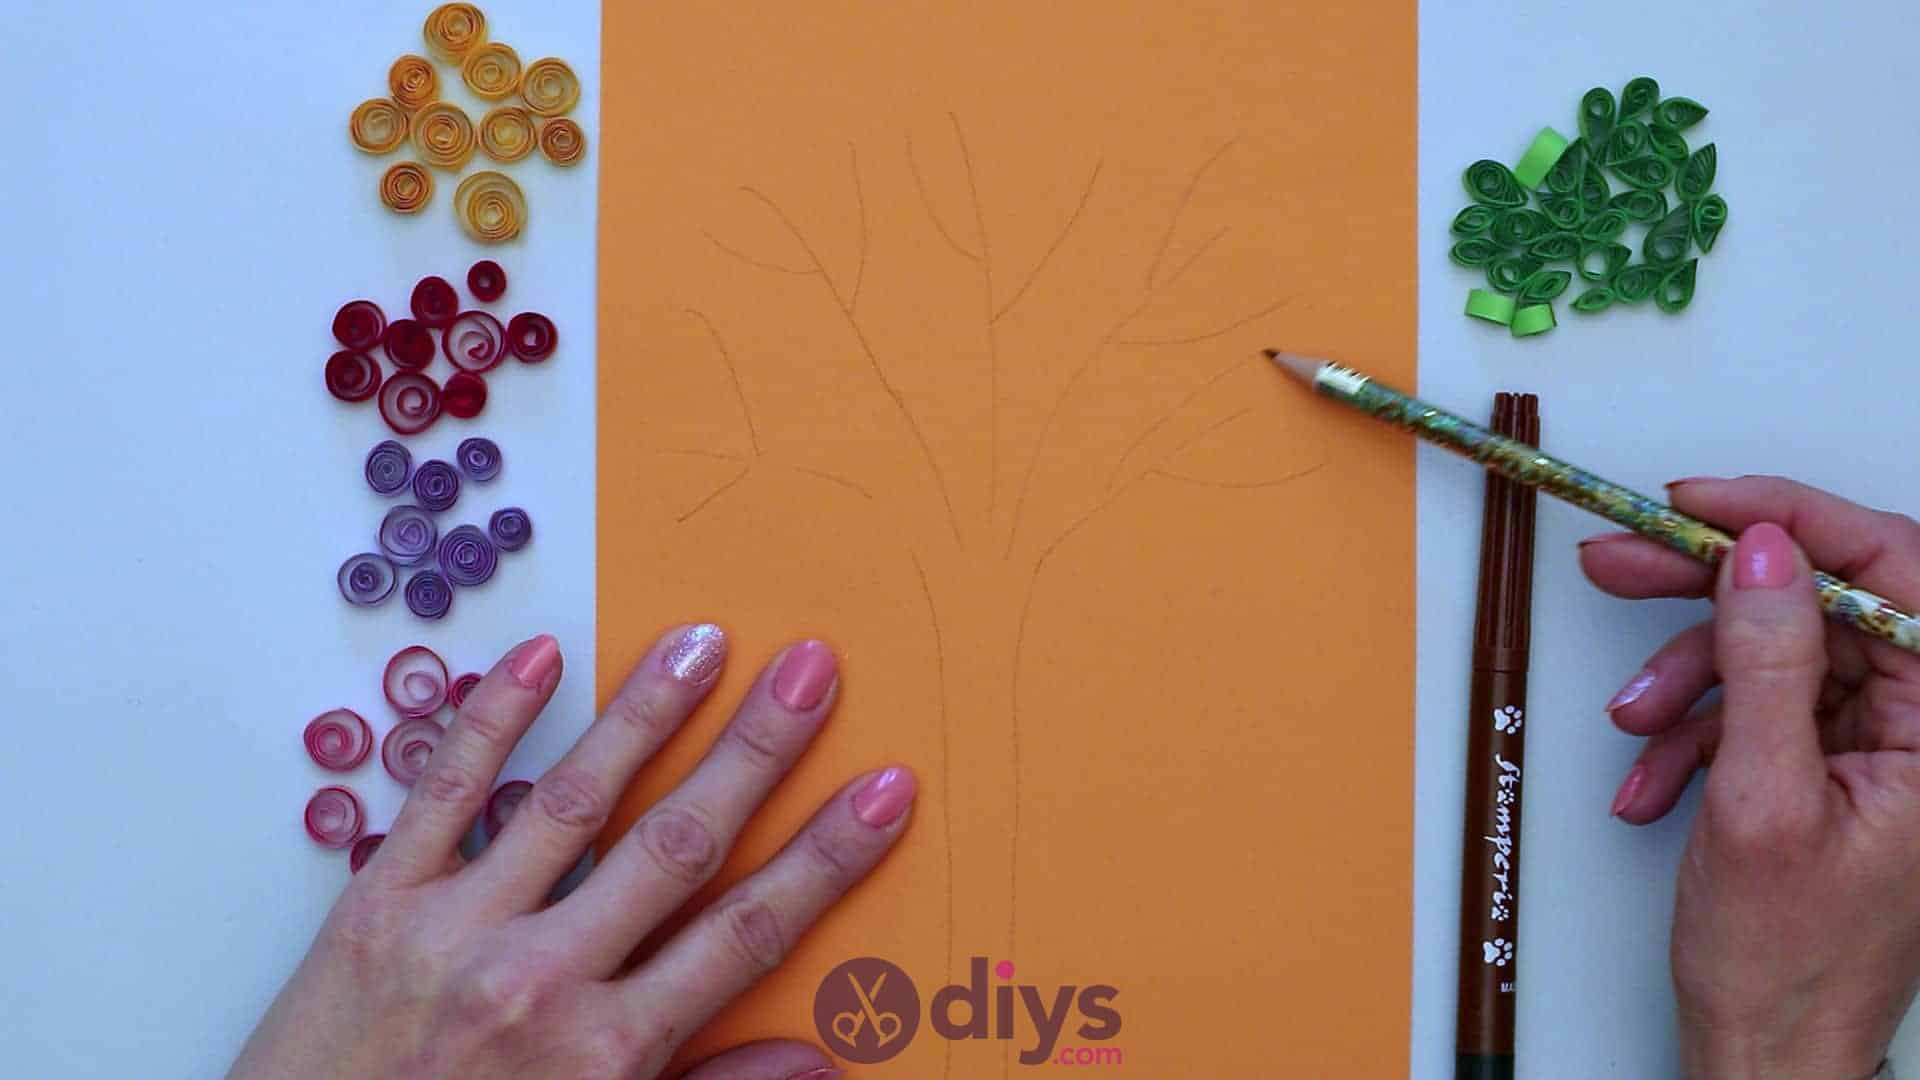 Diy paper spring tree step 5a